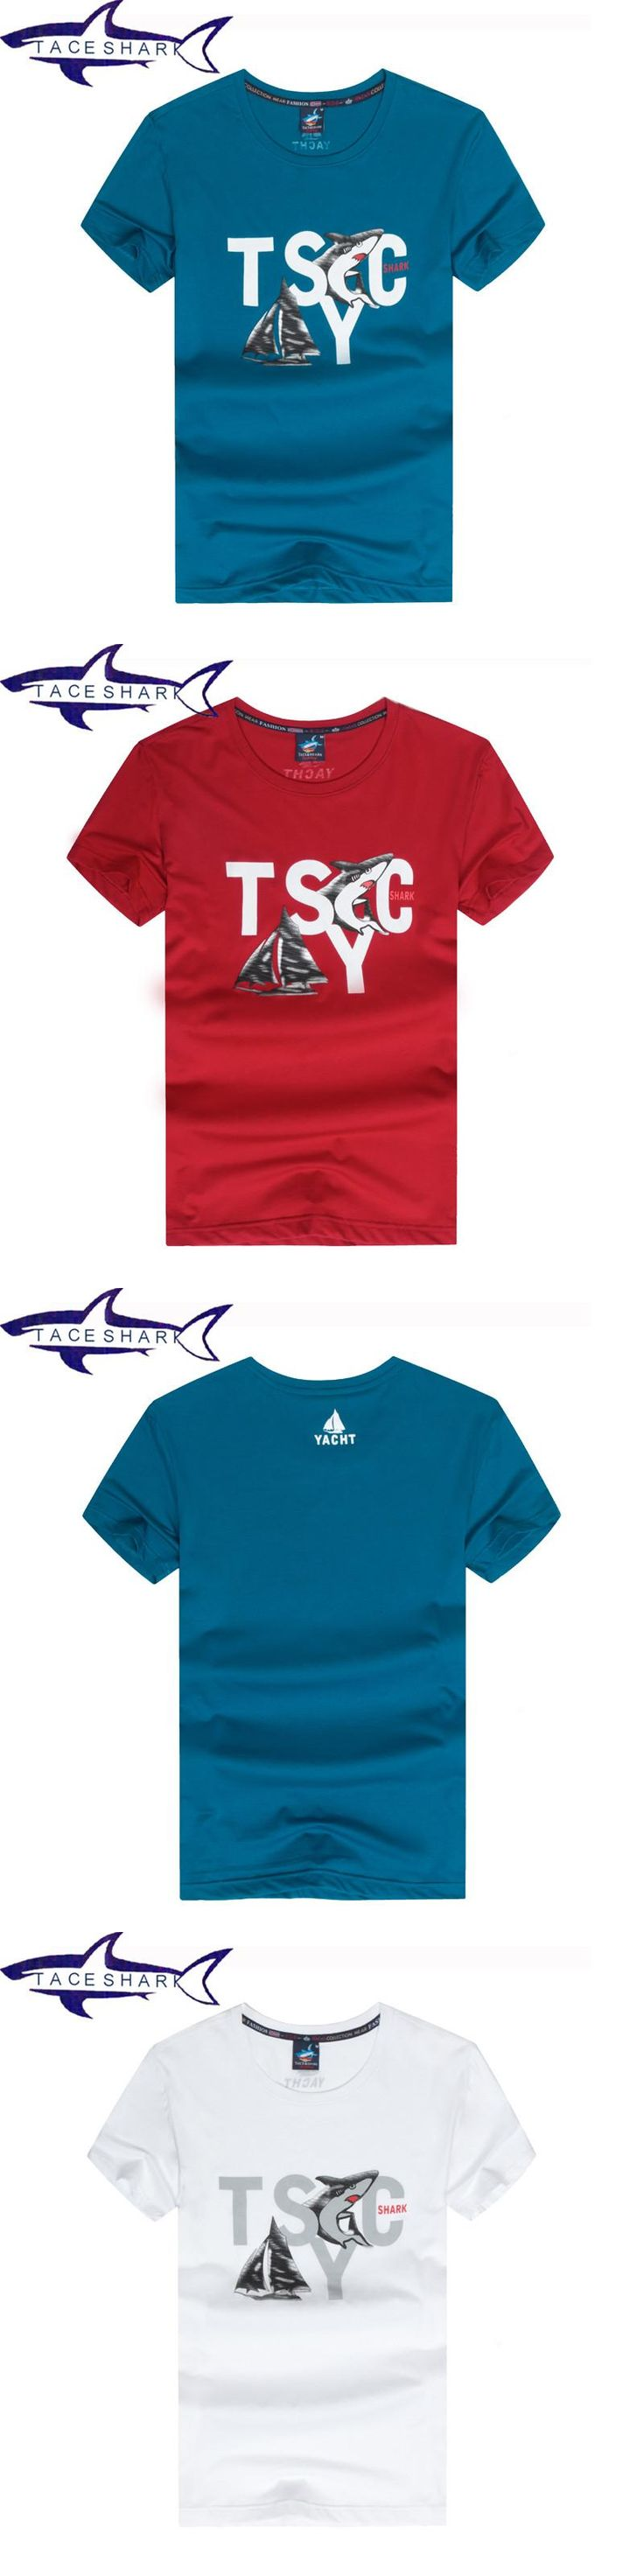 Mens t shirt fashion 2017 brand clothing Tace & Shark yachting t shirts camiseta masculina chemise homme shark t shirt men